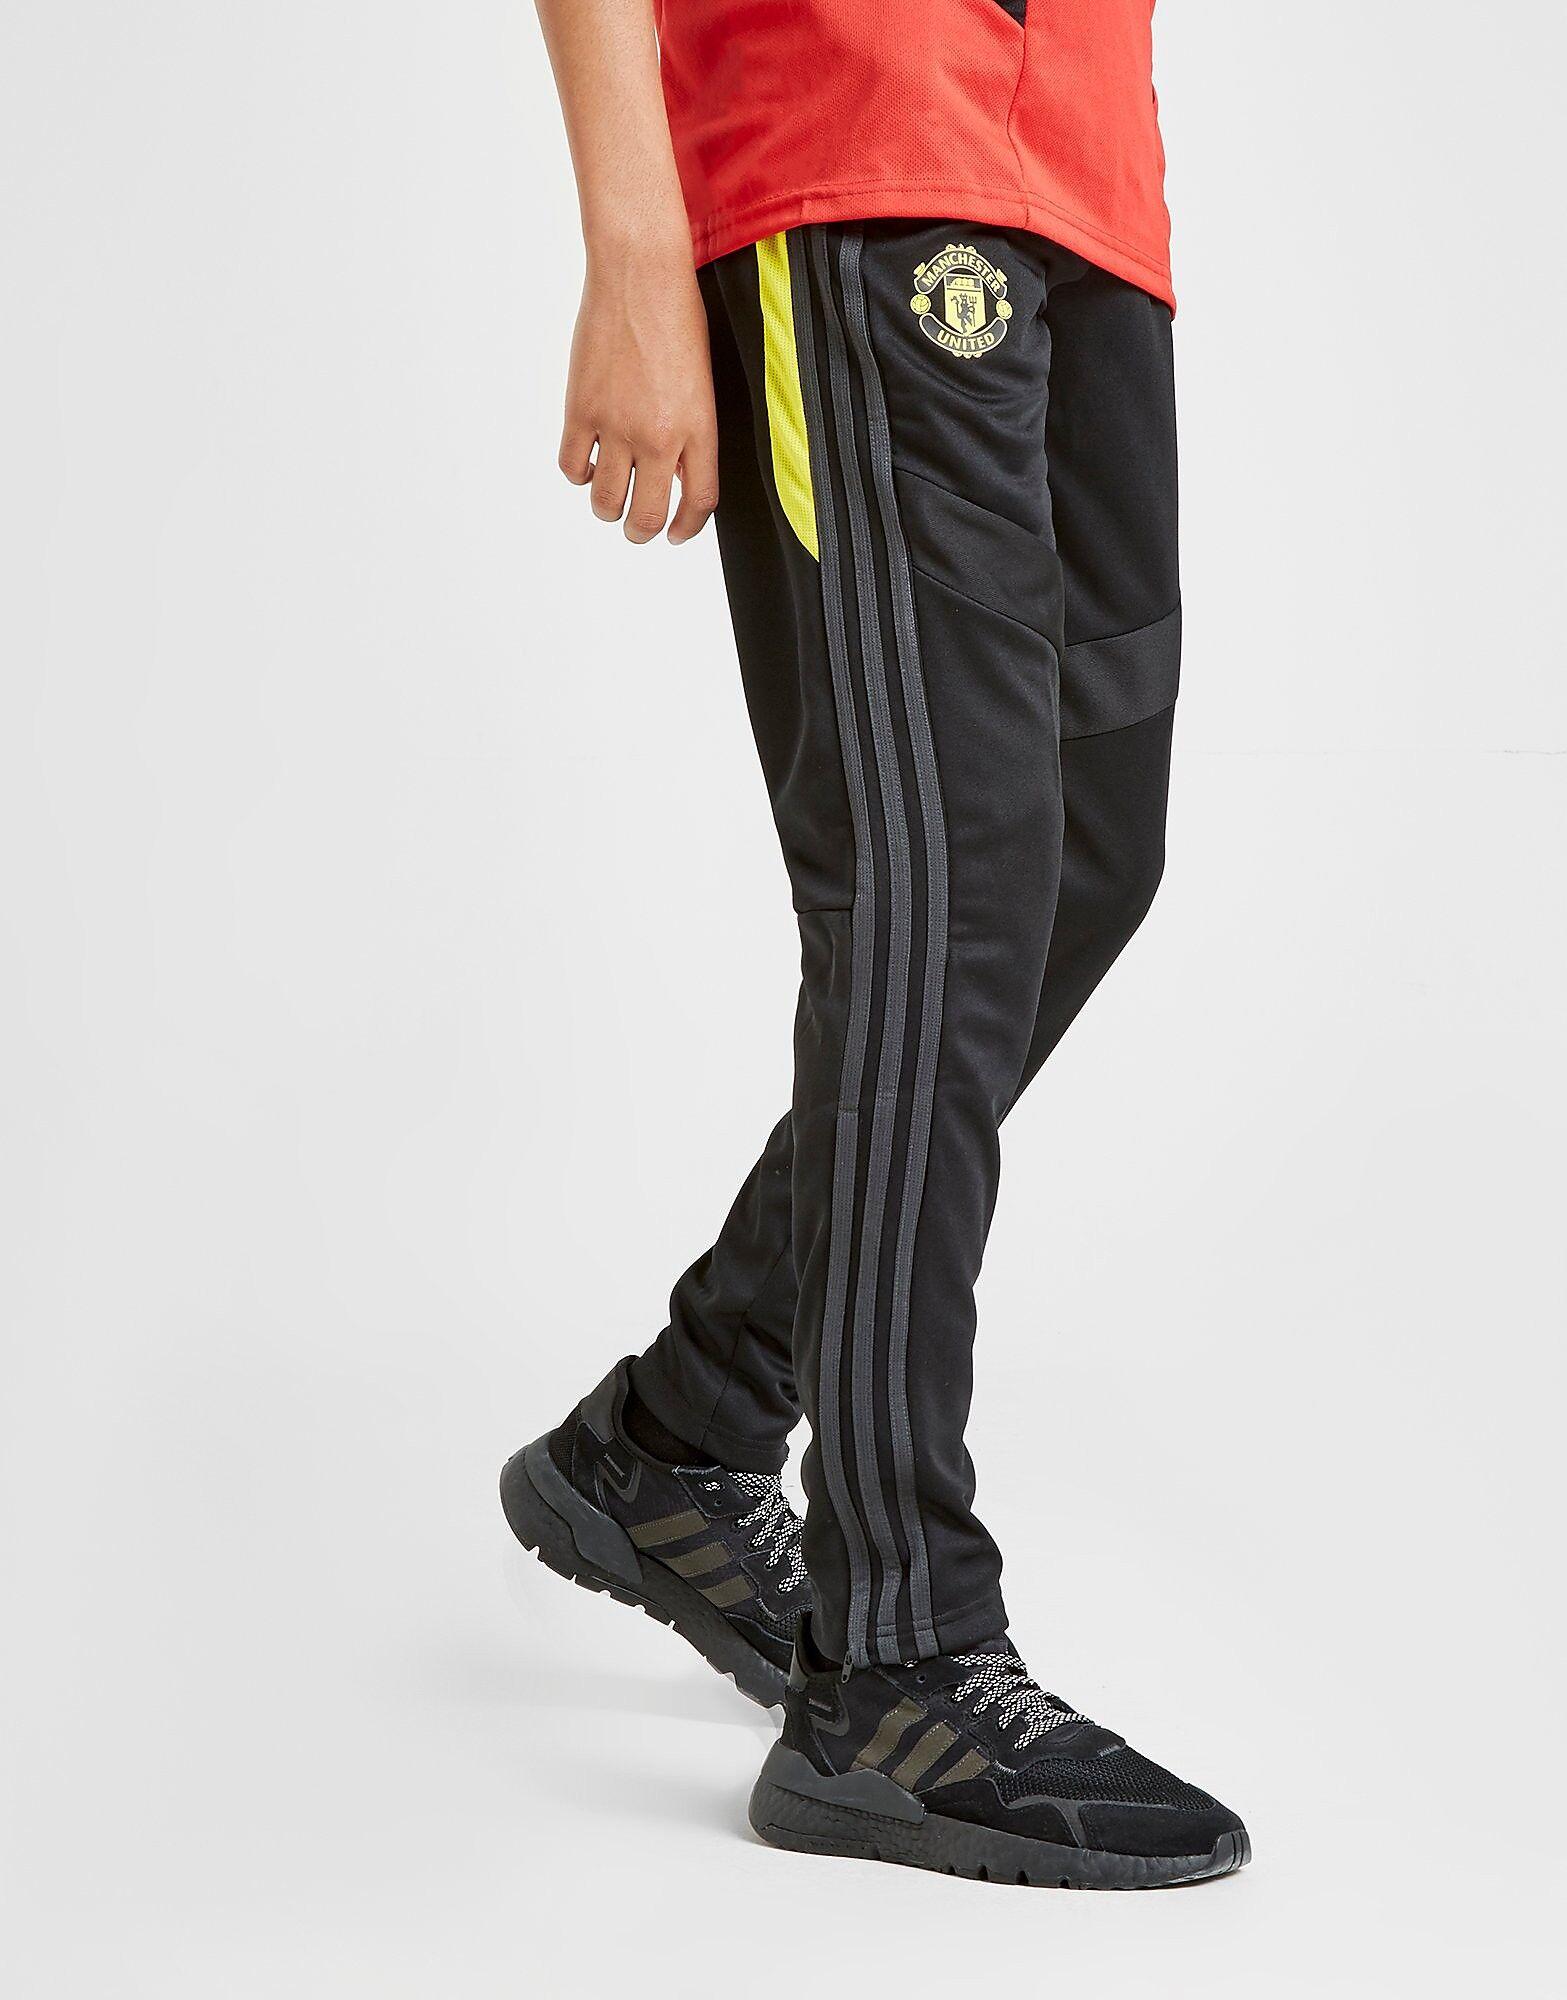 Image of Adidas Manchester United FC Treenihousut Miehet - Kids, Musta